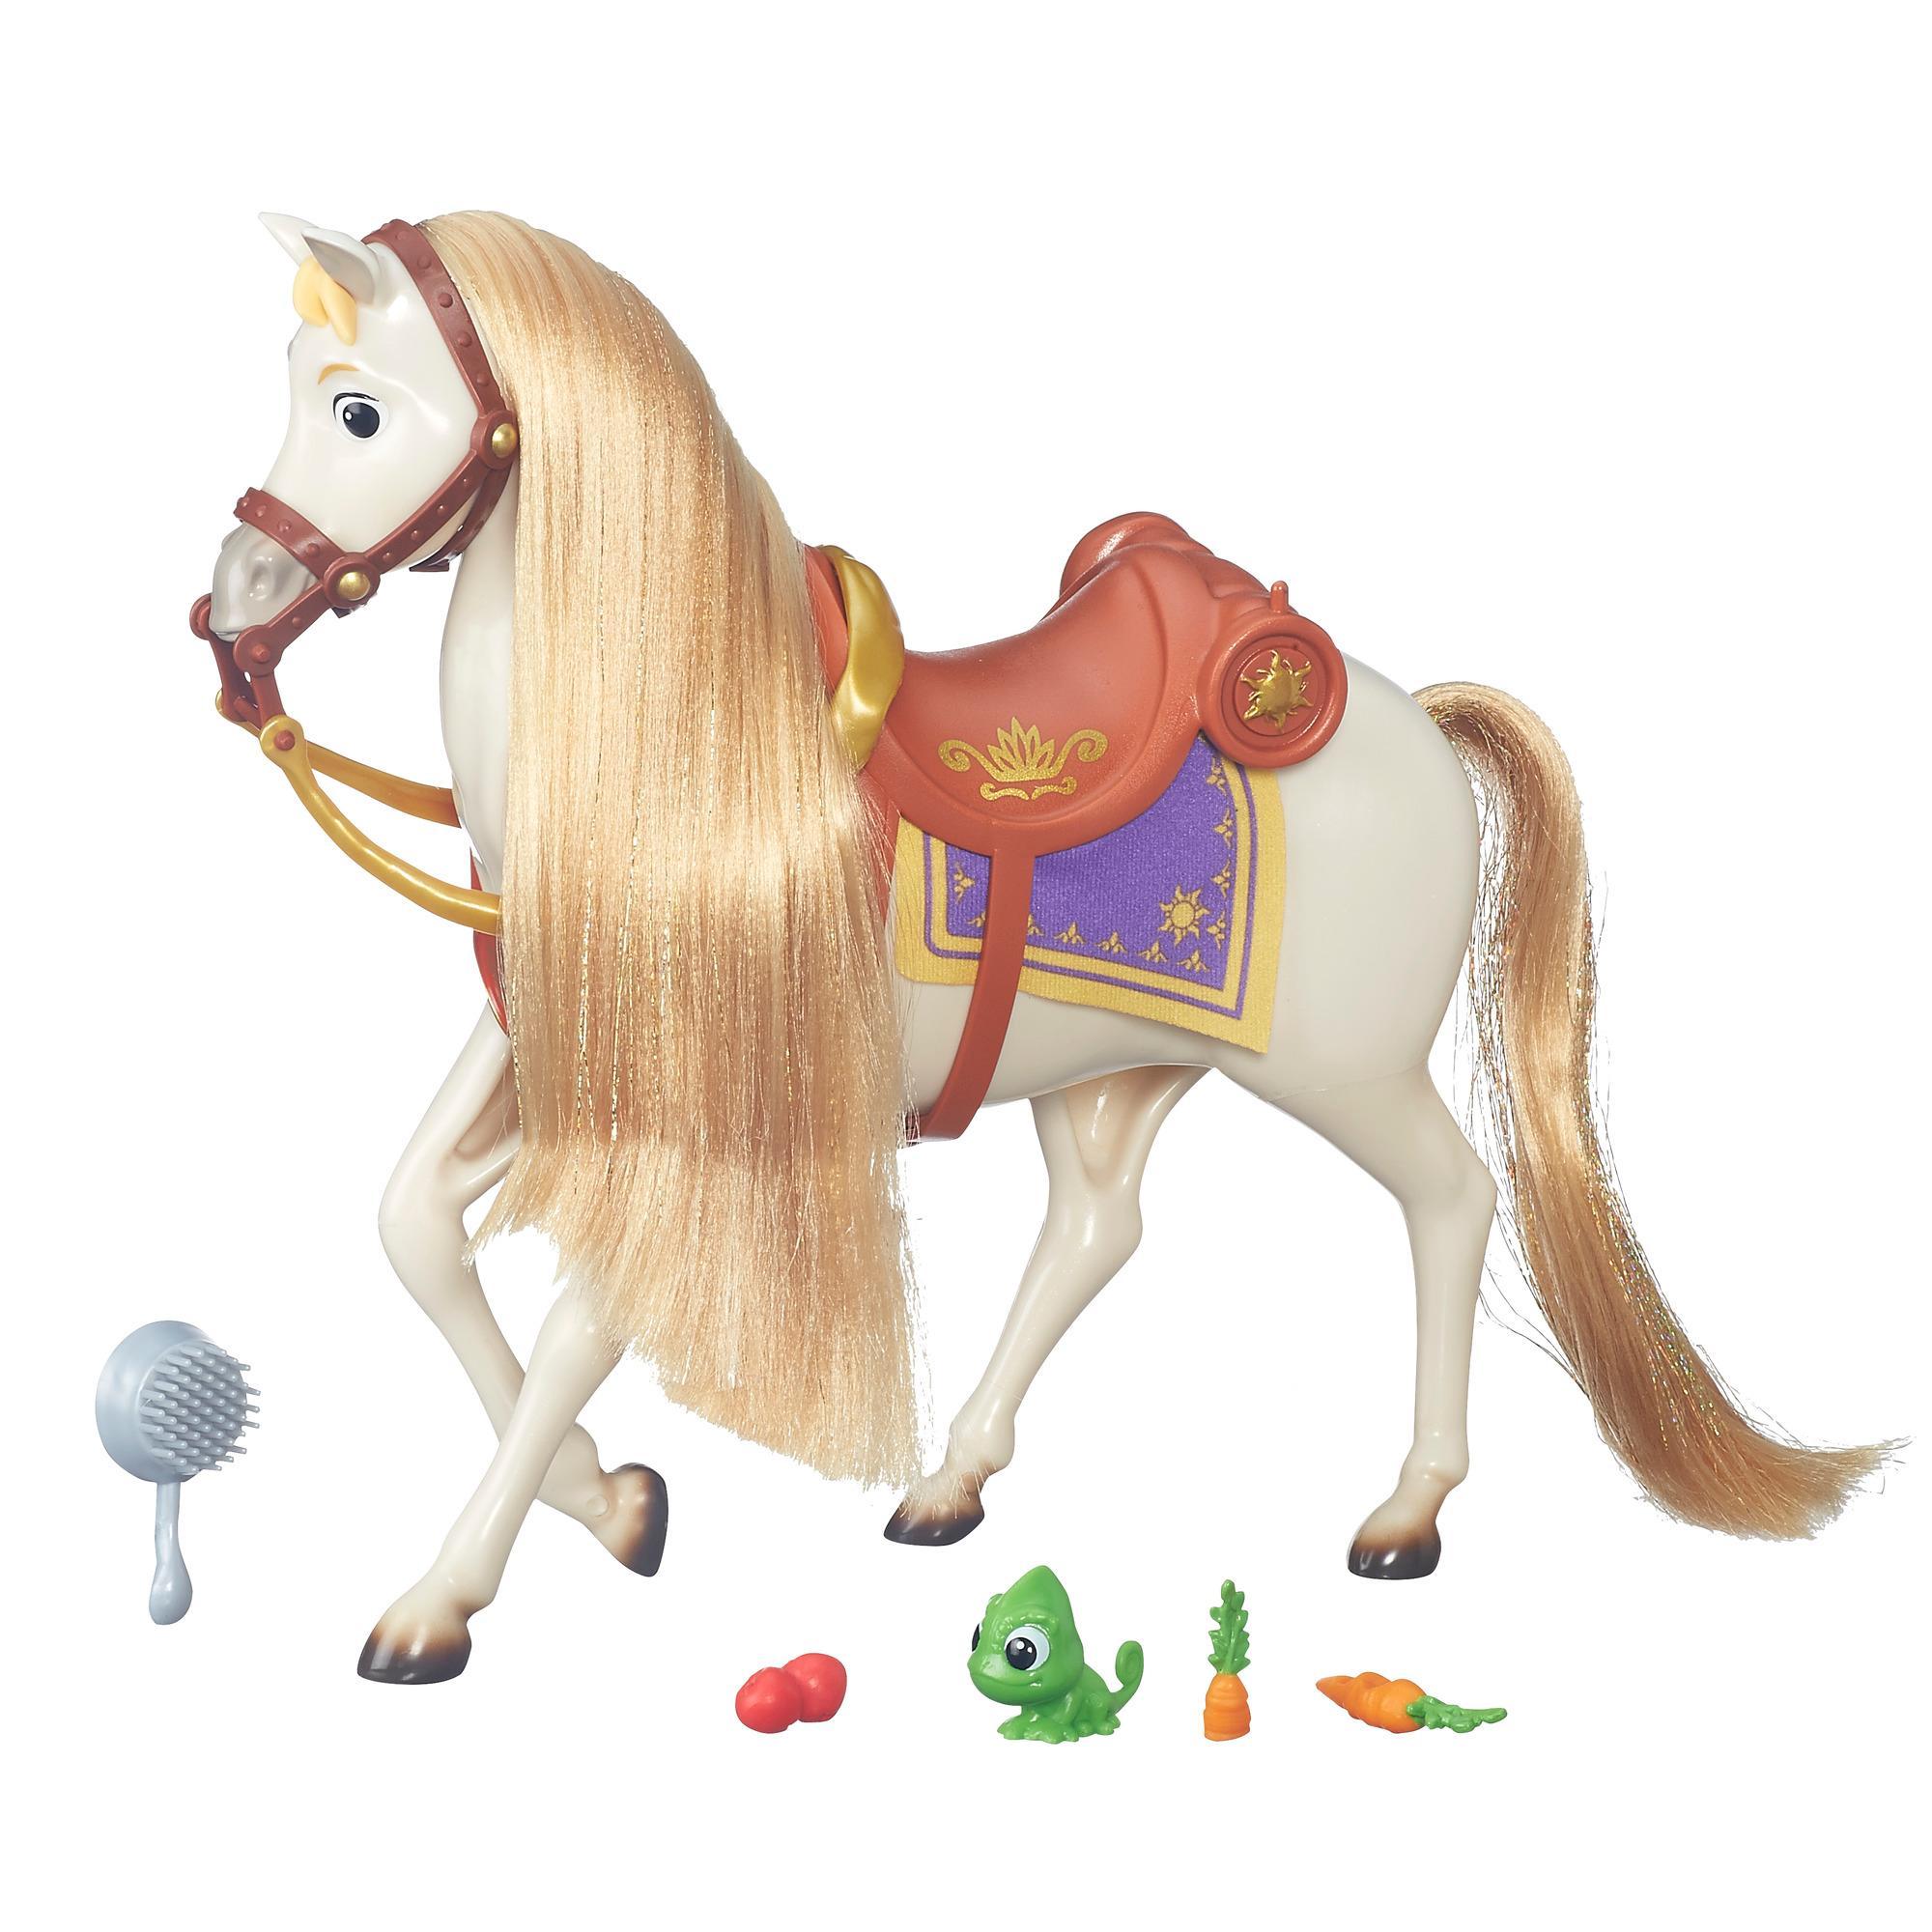 Disney Princess Rapunzel's Horse Maximus